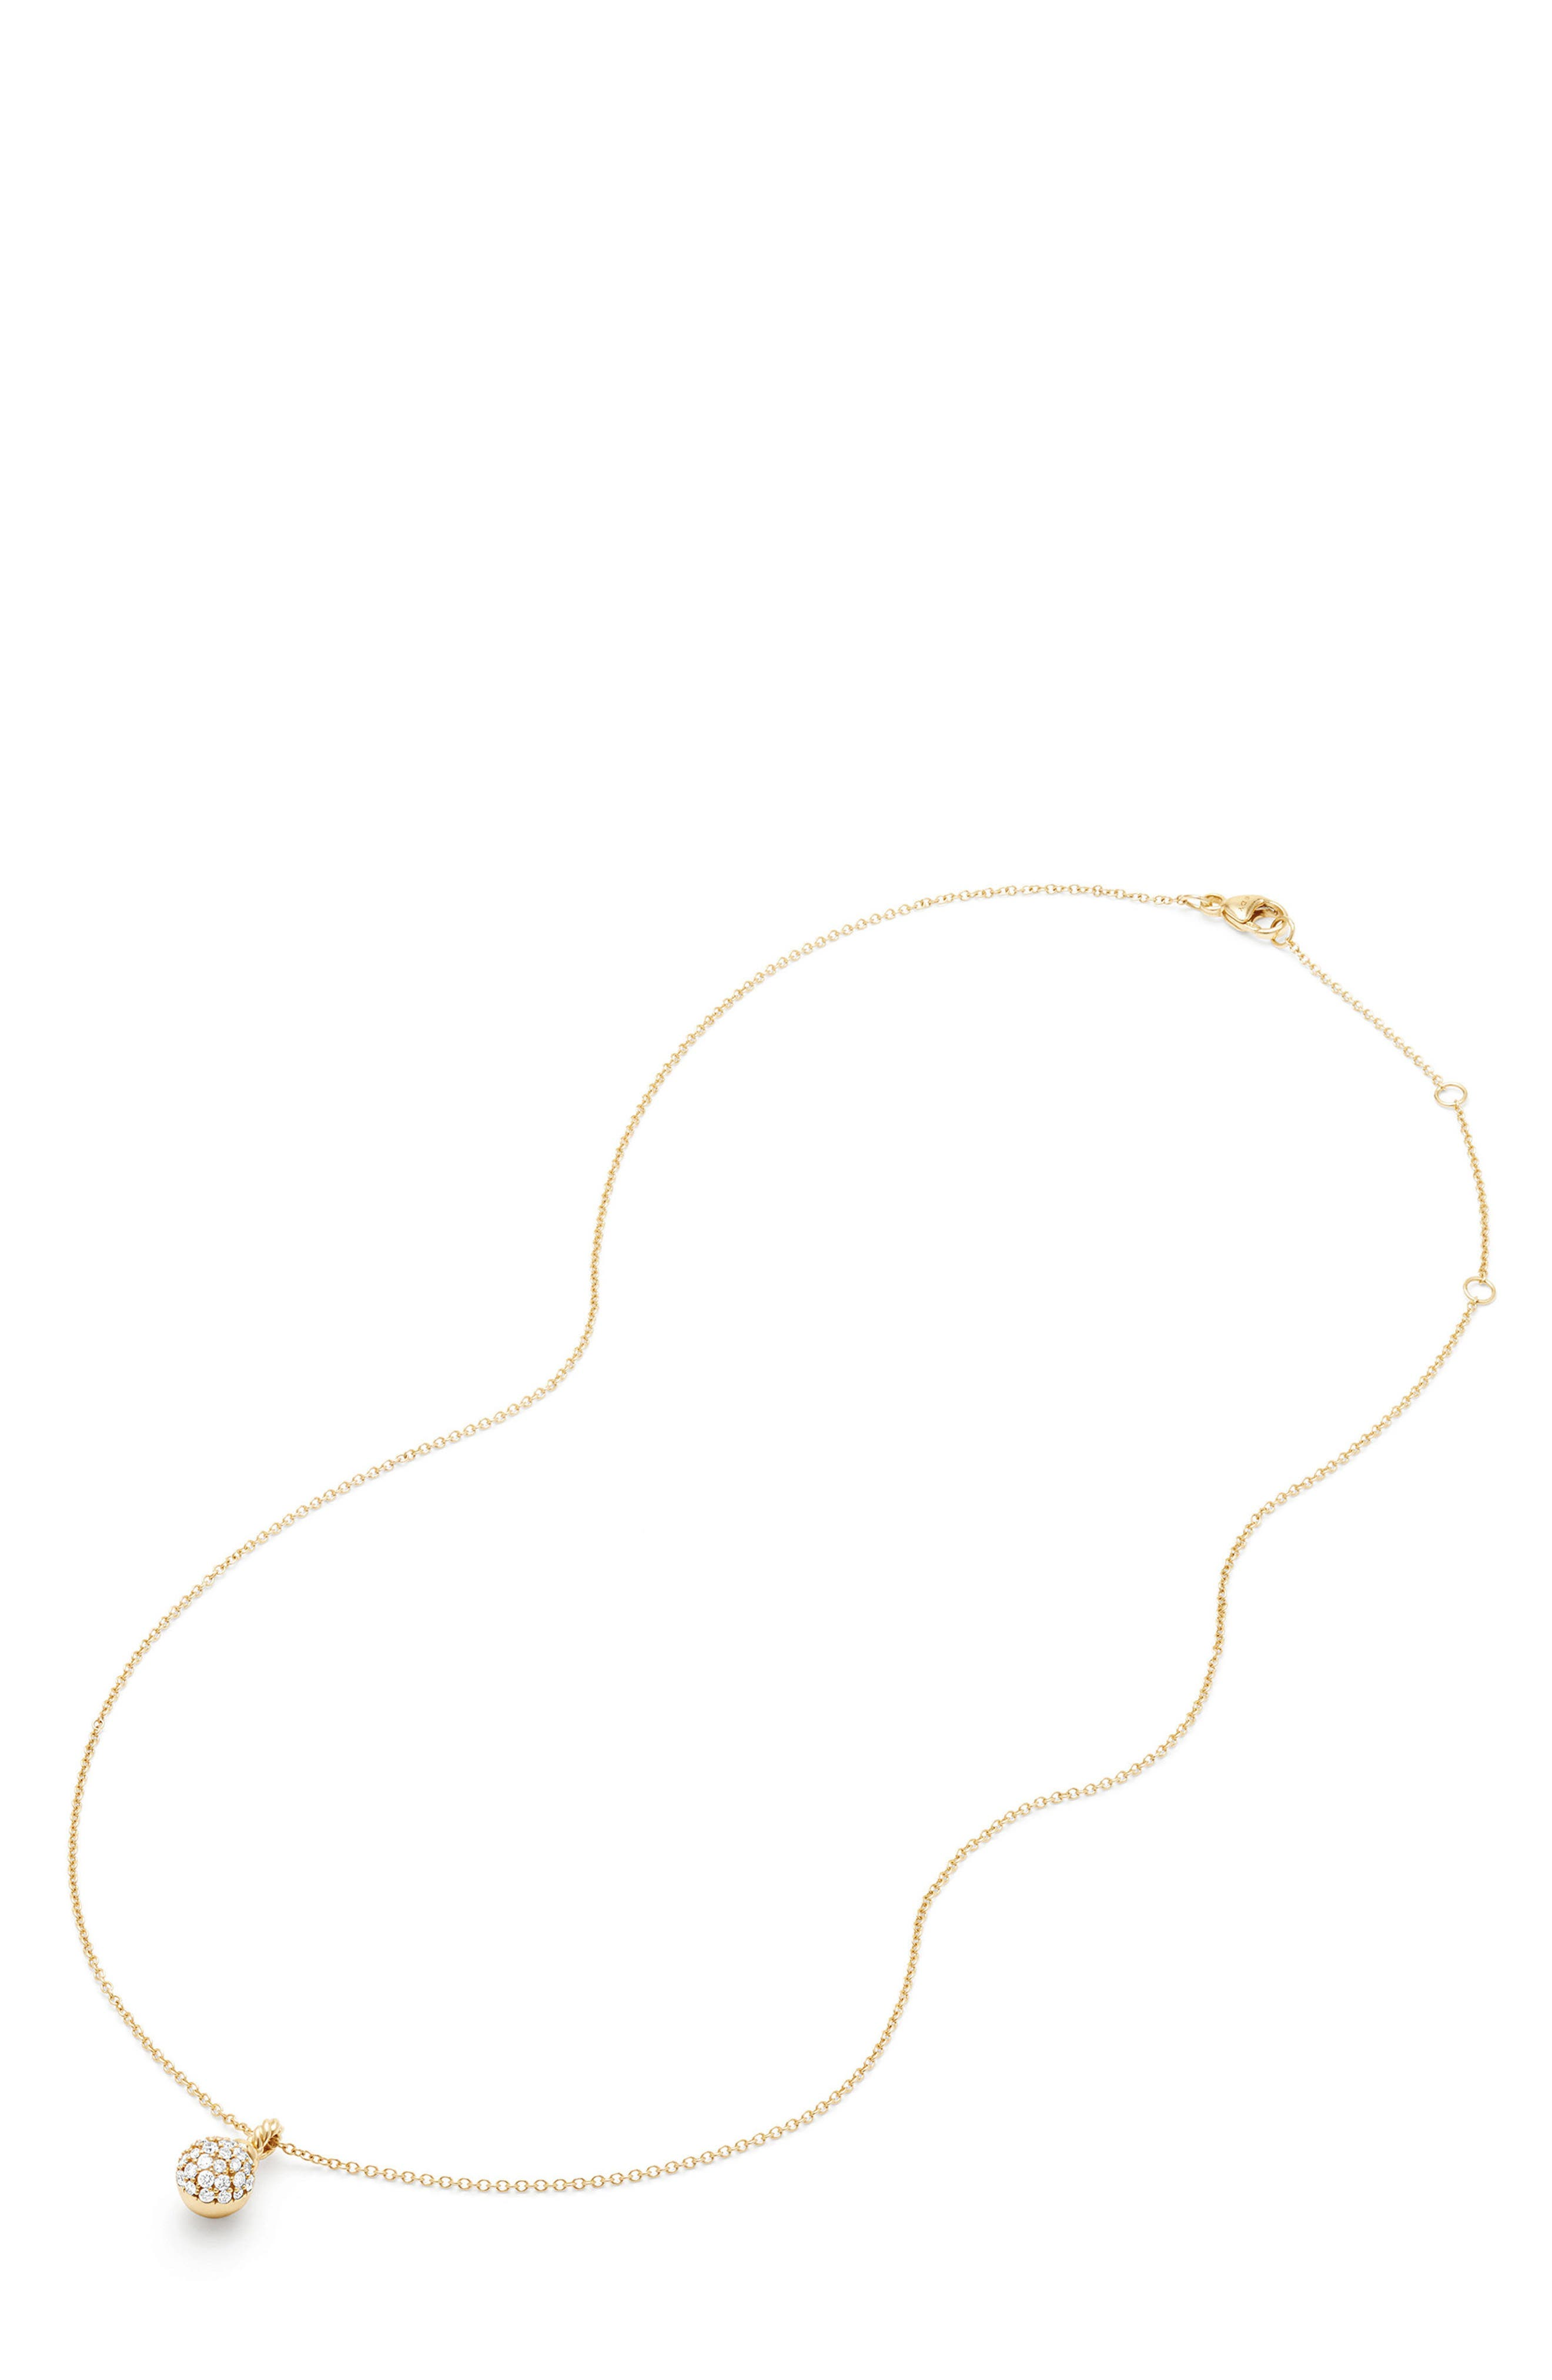 Petite Solari Pavé Necklace with Diamonds in 18K Gold,                             Alternate thumbnail 3, color,                             Yellow Gold/ Diamond